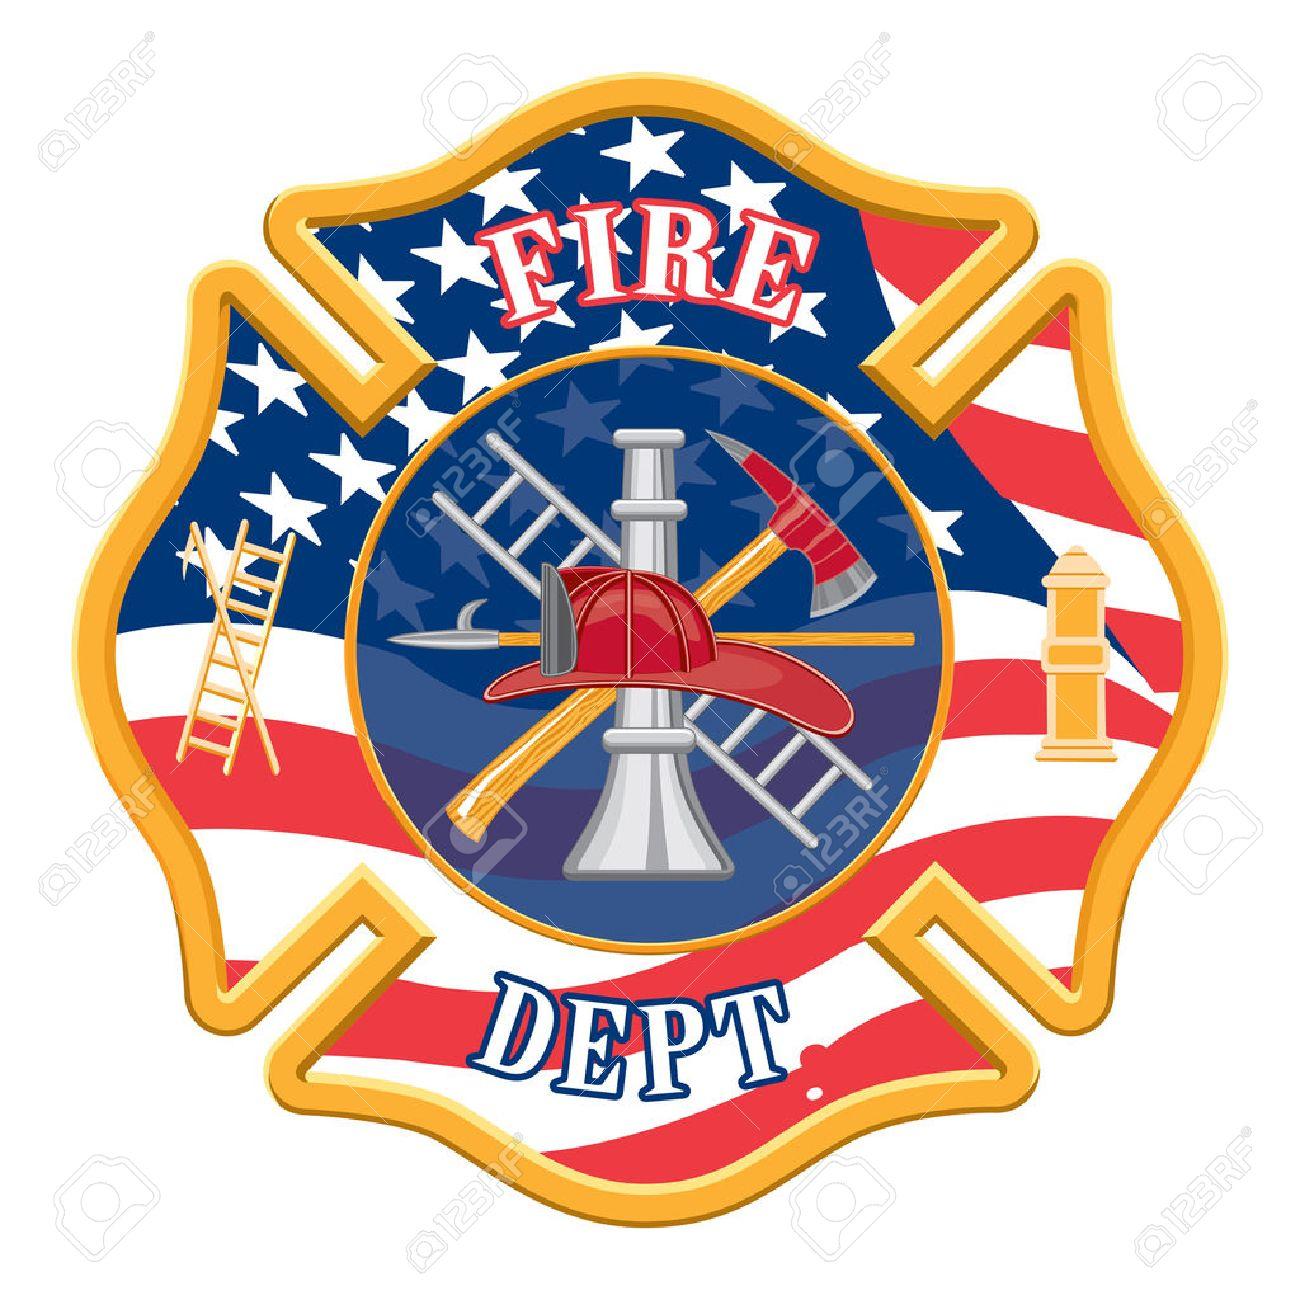 Fire Department Cross Is An Illustration Of A Fire Department ...